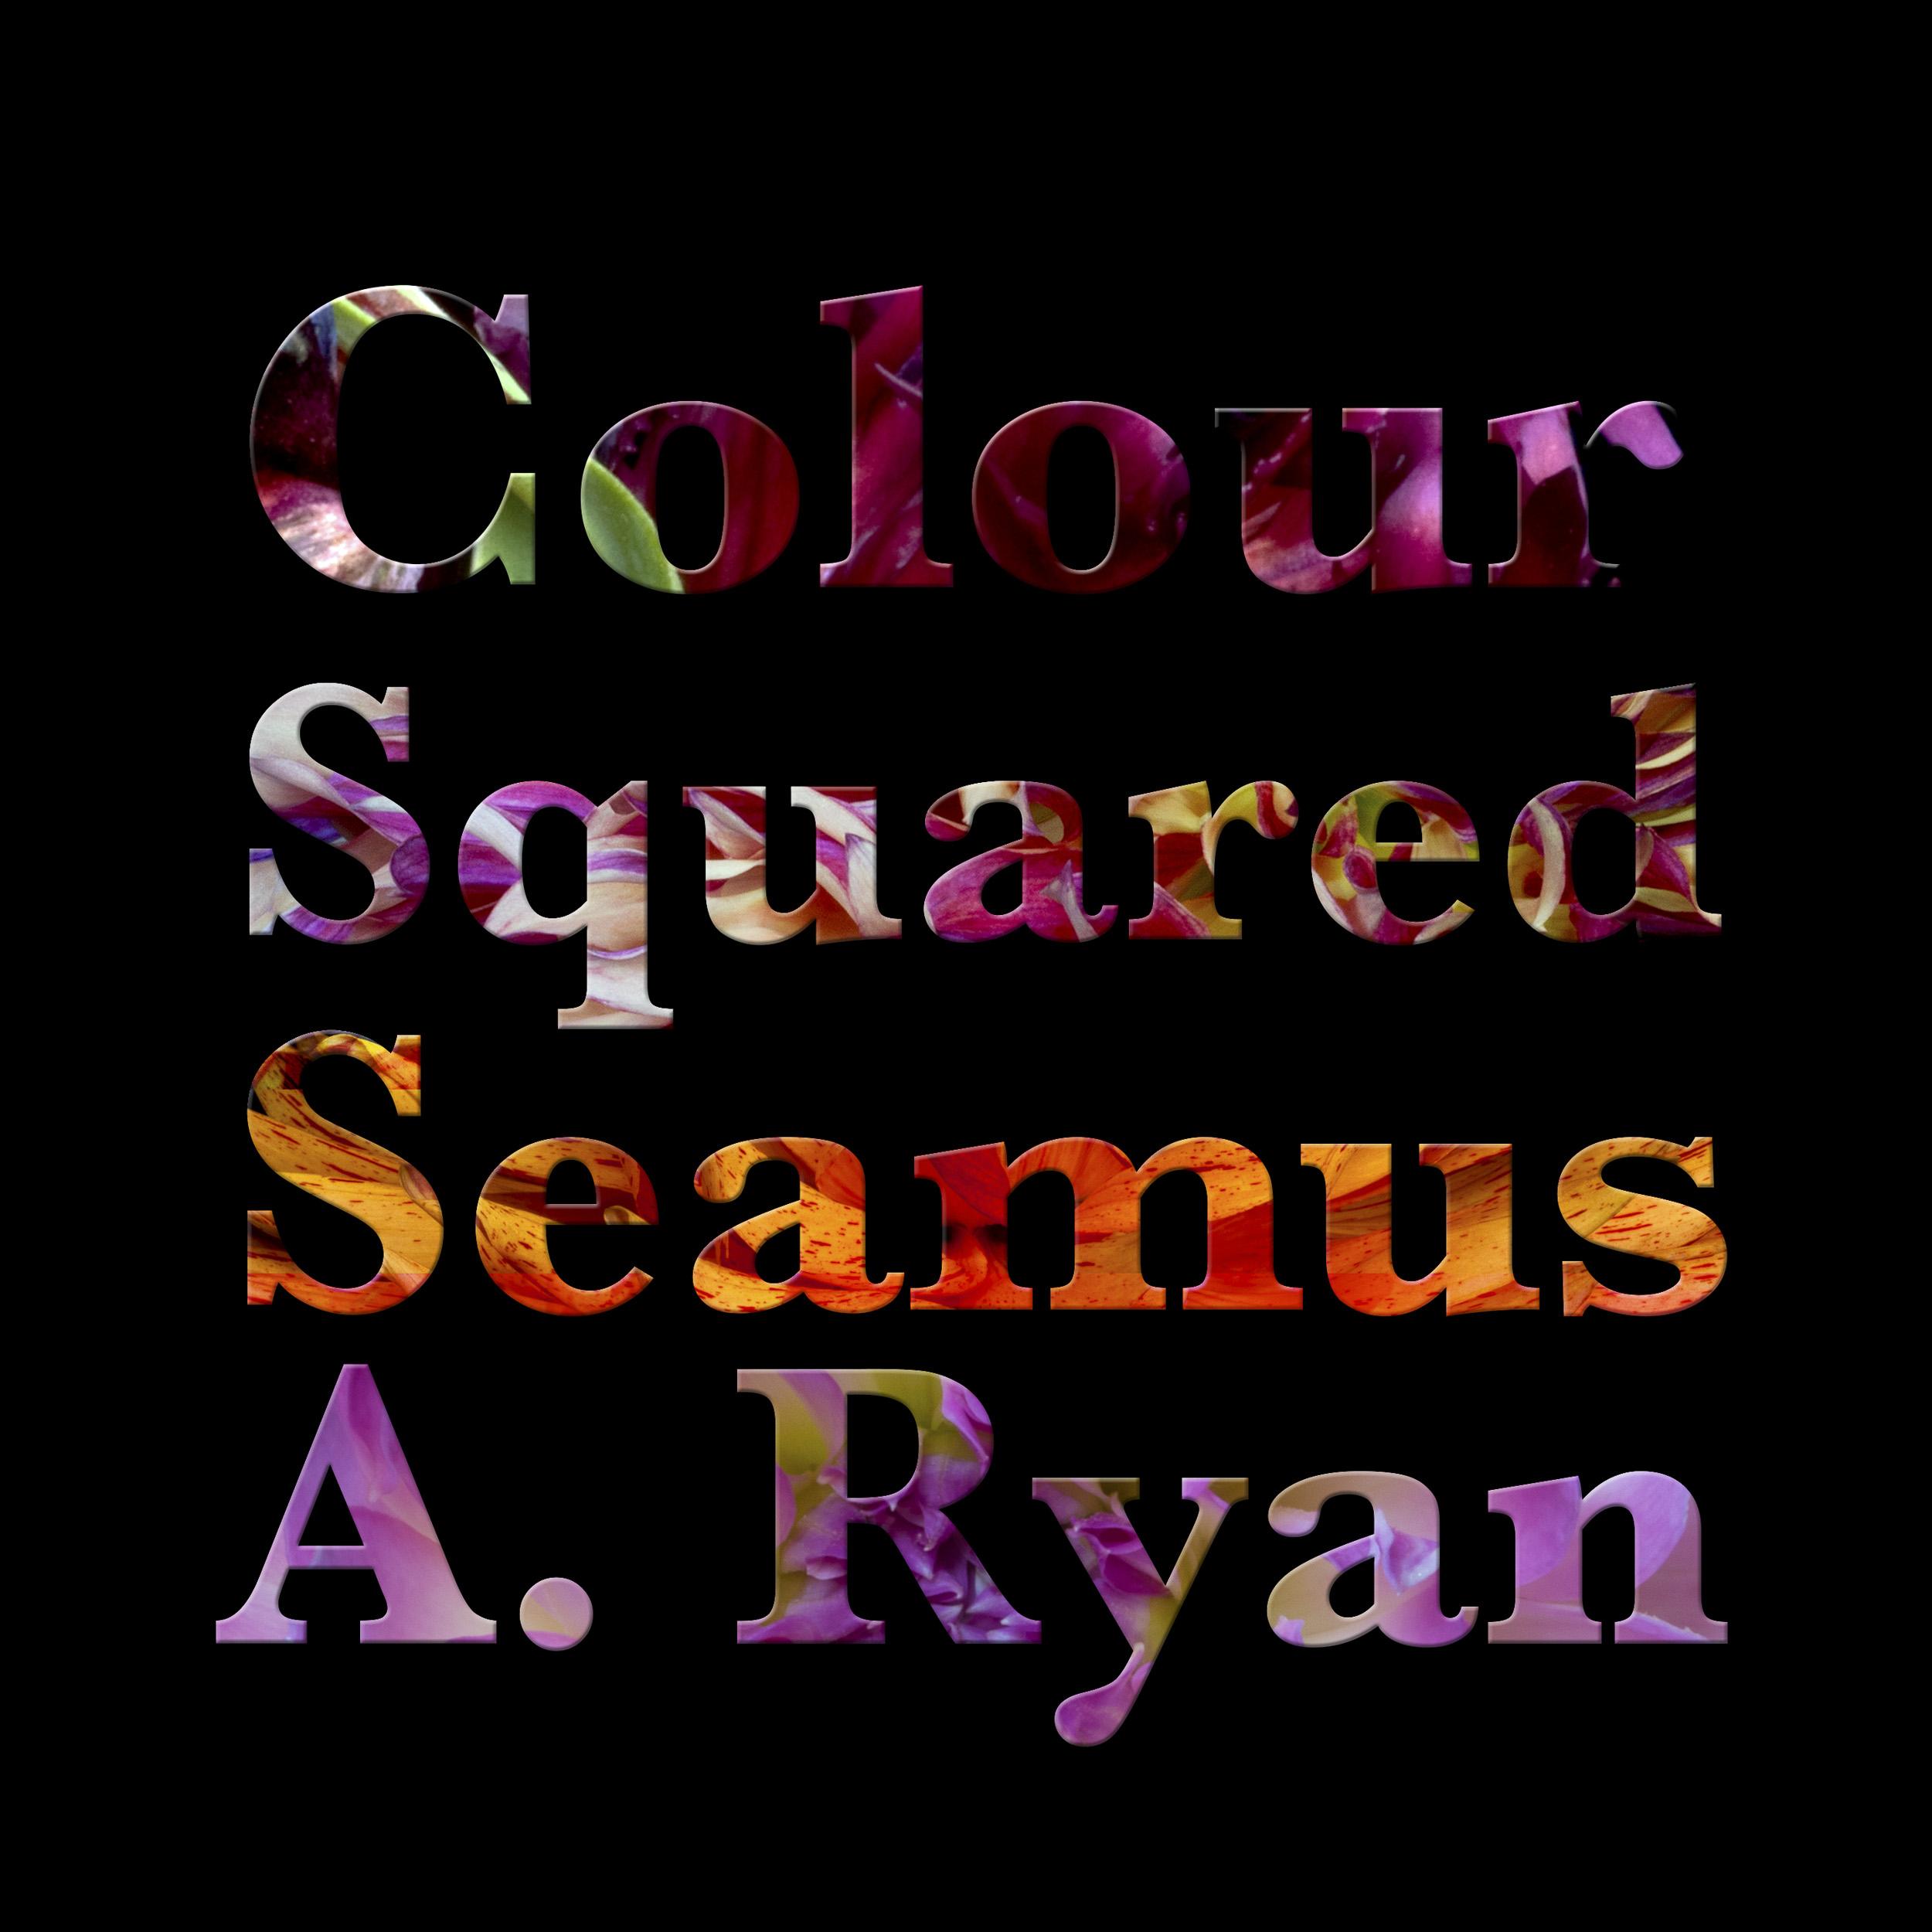 colour-squared1.jpg